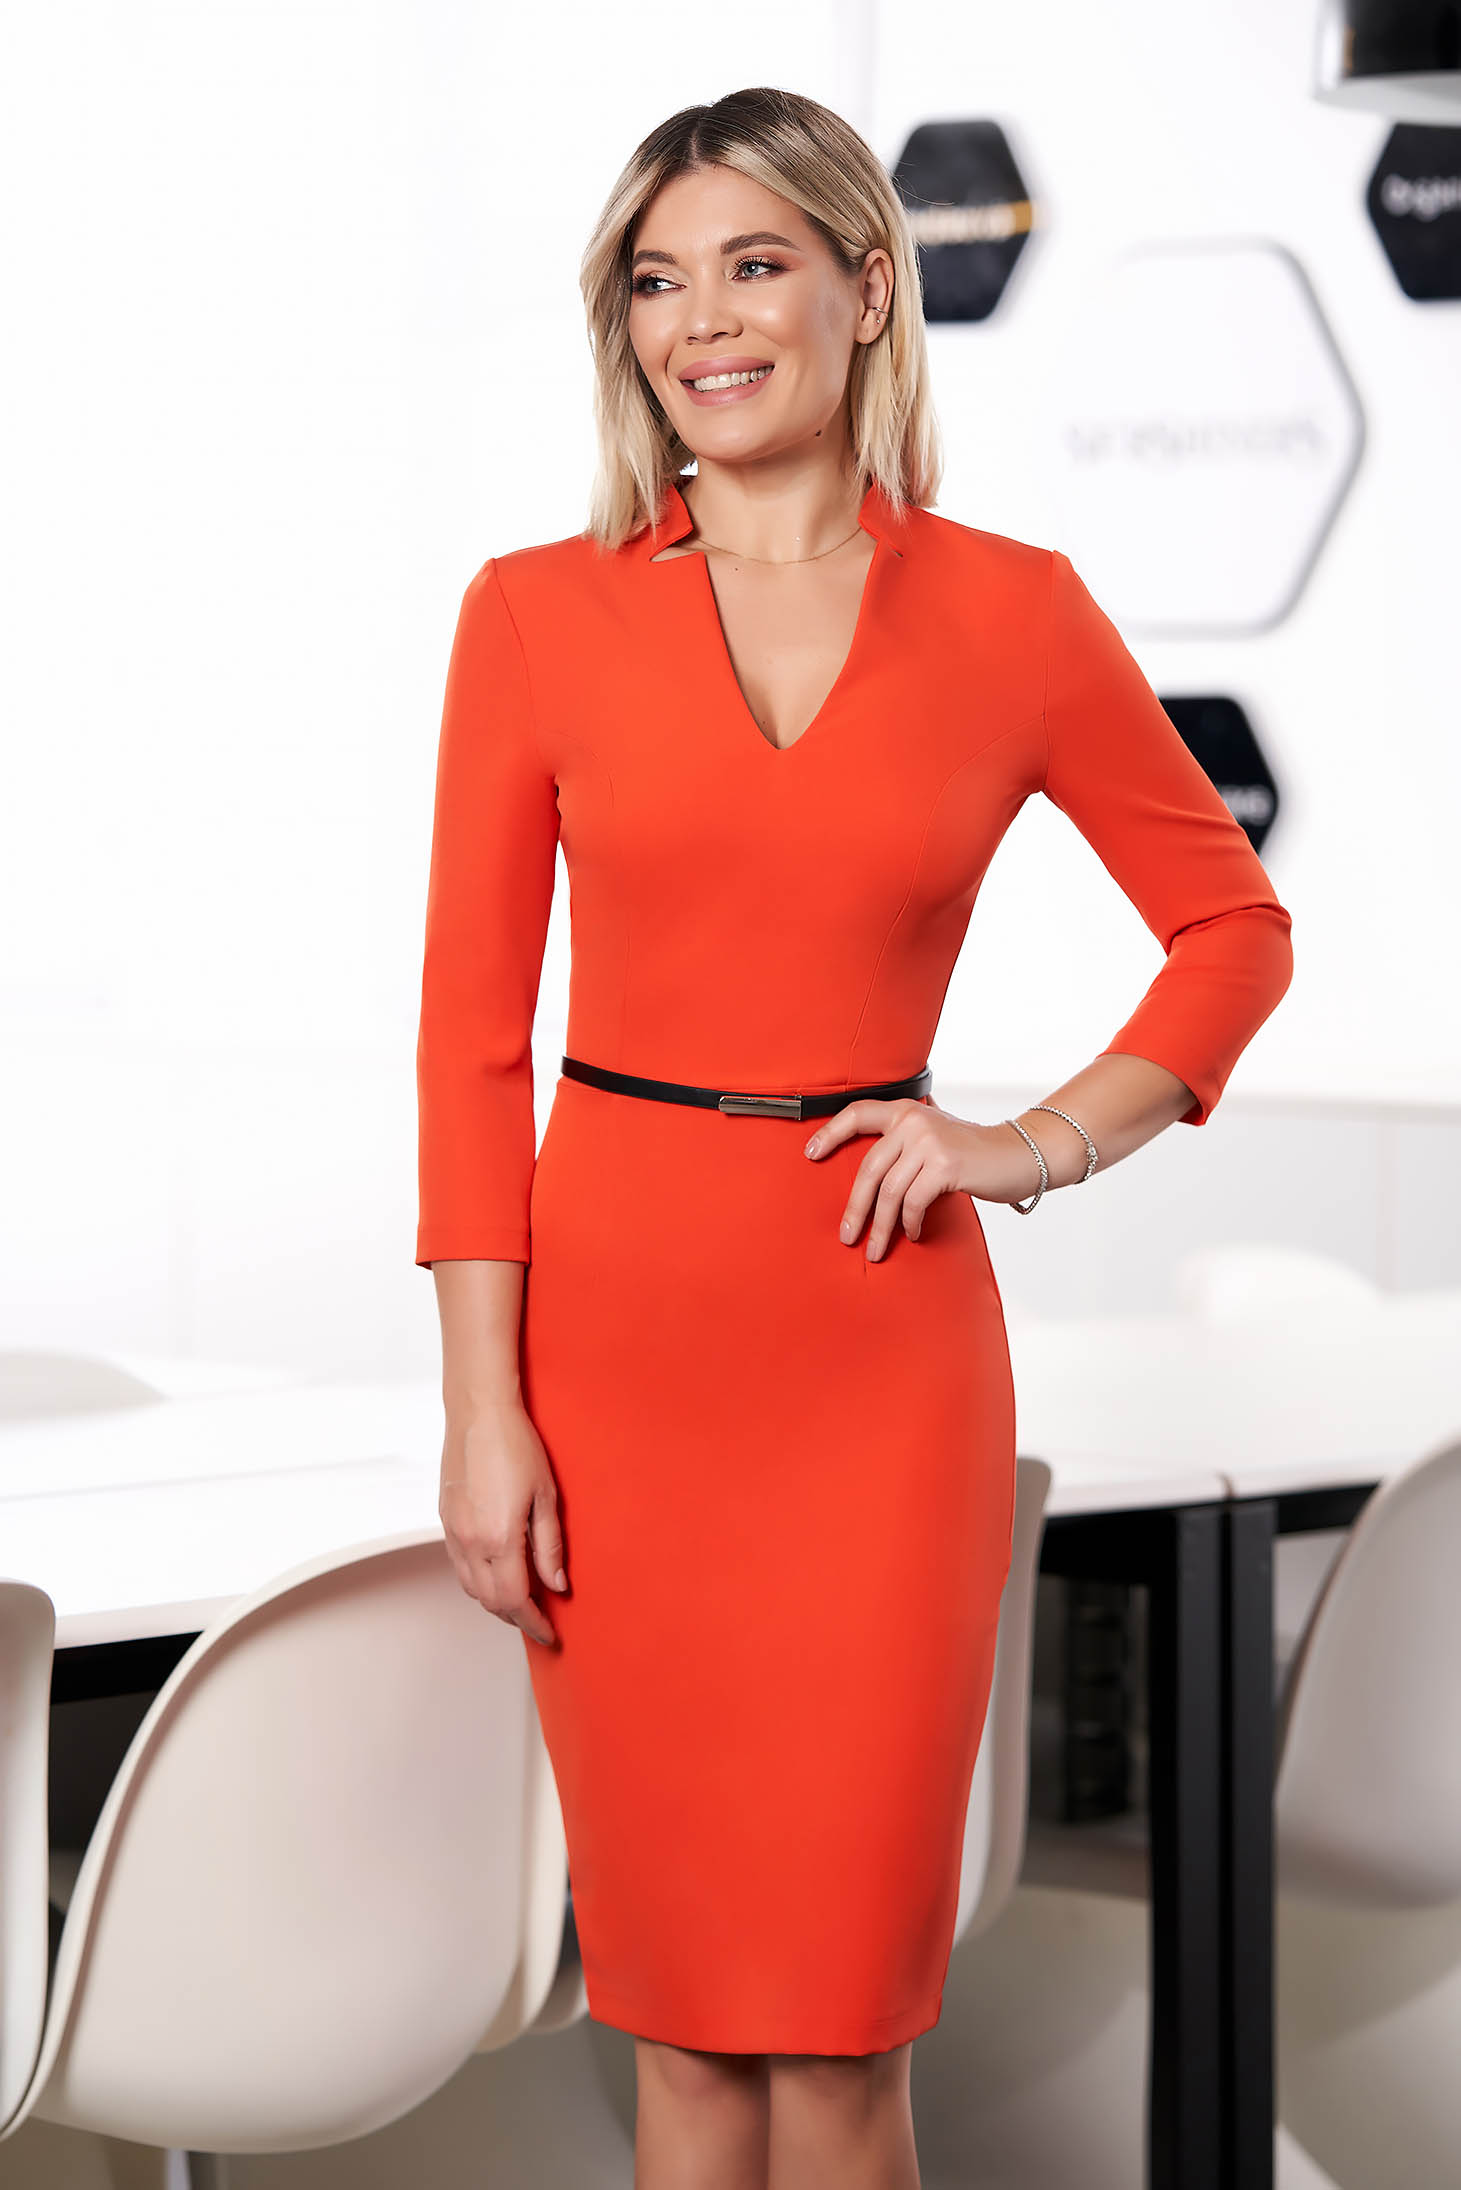 Rochie StarShinerS portocalie office midi tip creion din stofa elastica cu decolteu in v si maneci trei-sferturi